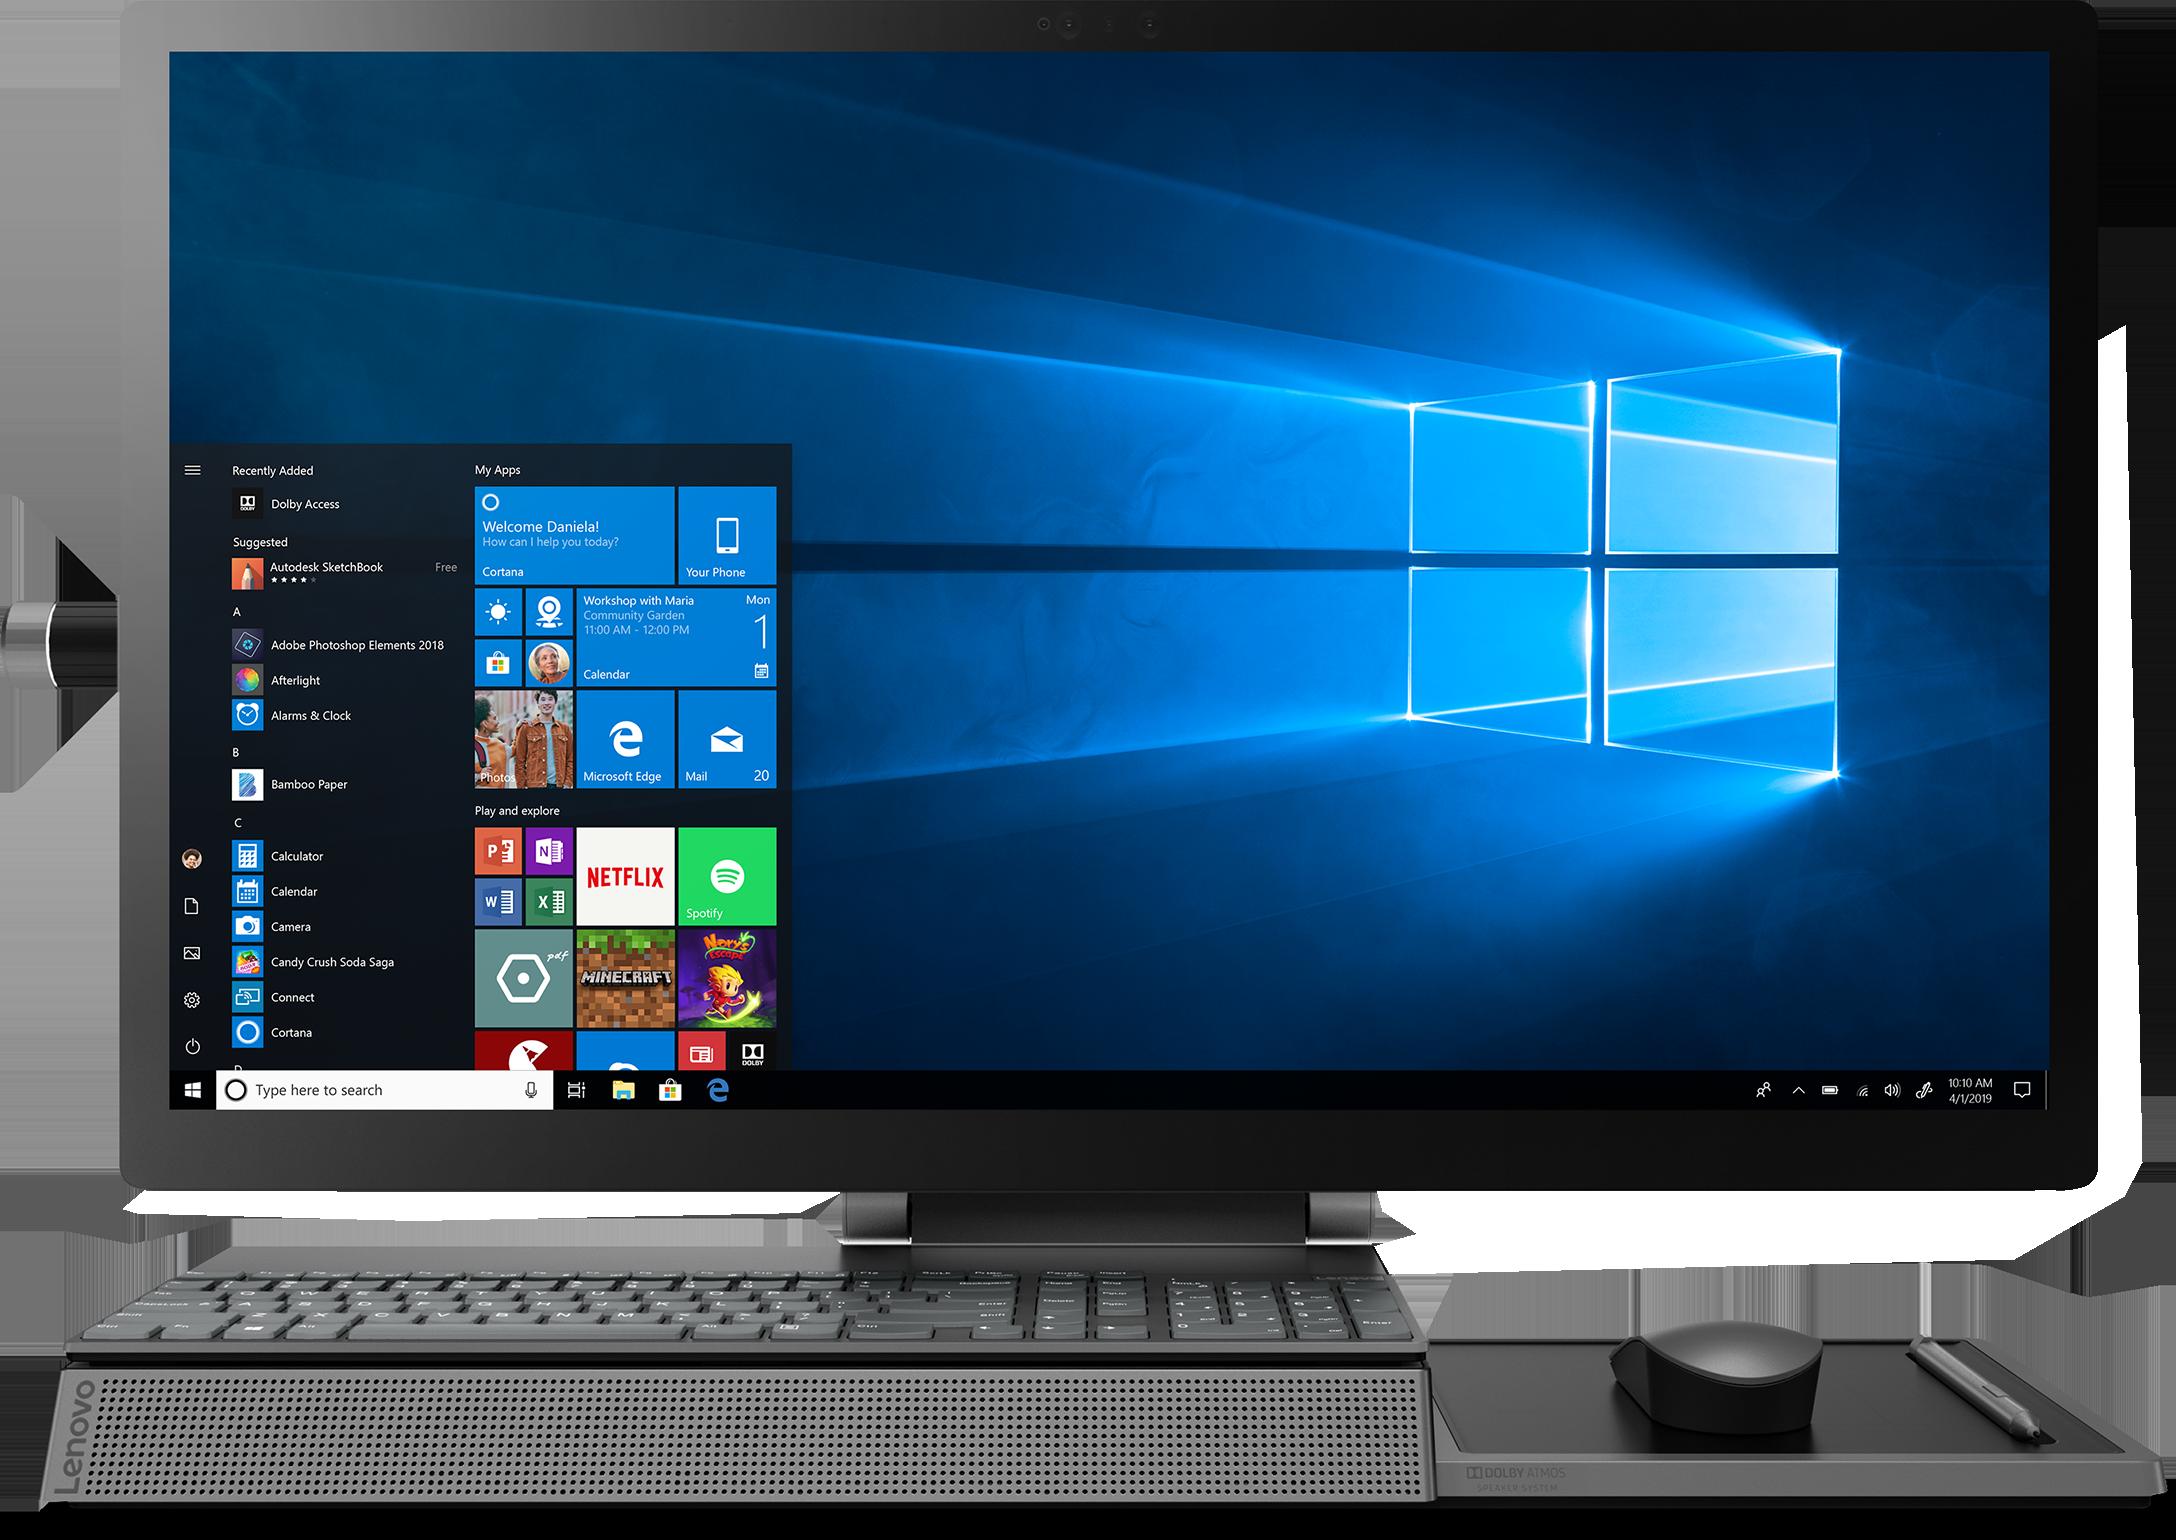 RE3d3uq?ver=3eb5 - Lenovo Yoga A940 F0E50000US All-in-One